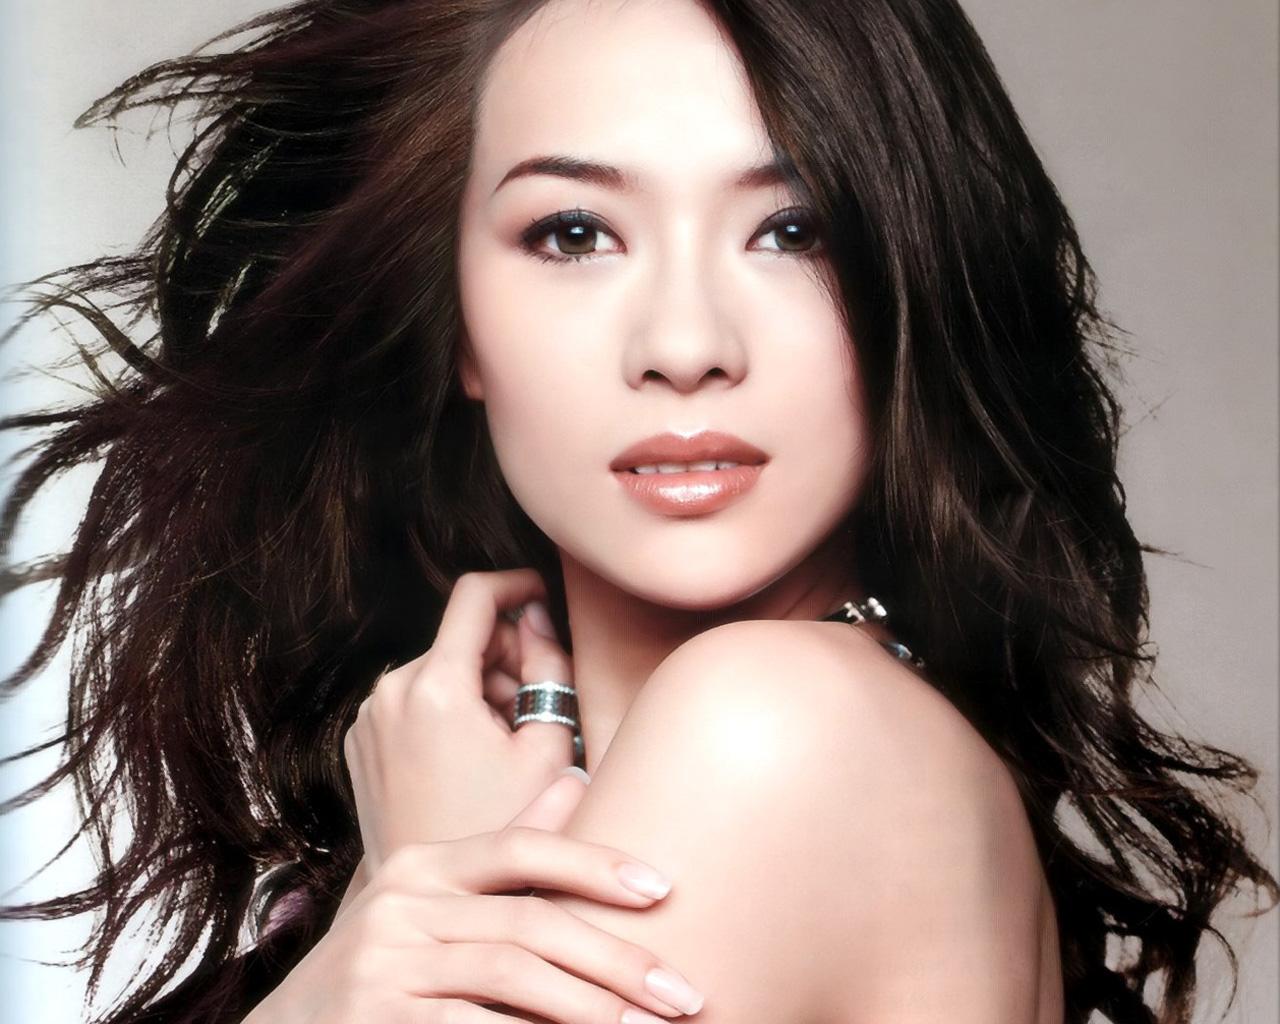 http://4.bp.blogspot.com/-WLmV6kZrFDw/To7pa85tYuI/AAAAAAAAAMc/l1kxJb7vIUY/s1600/zhang-ziyi-the-most-popular-chinese-idol-in-hollywood-1.jpg